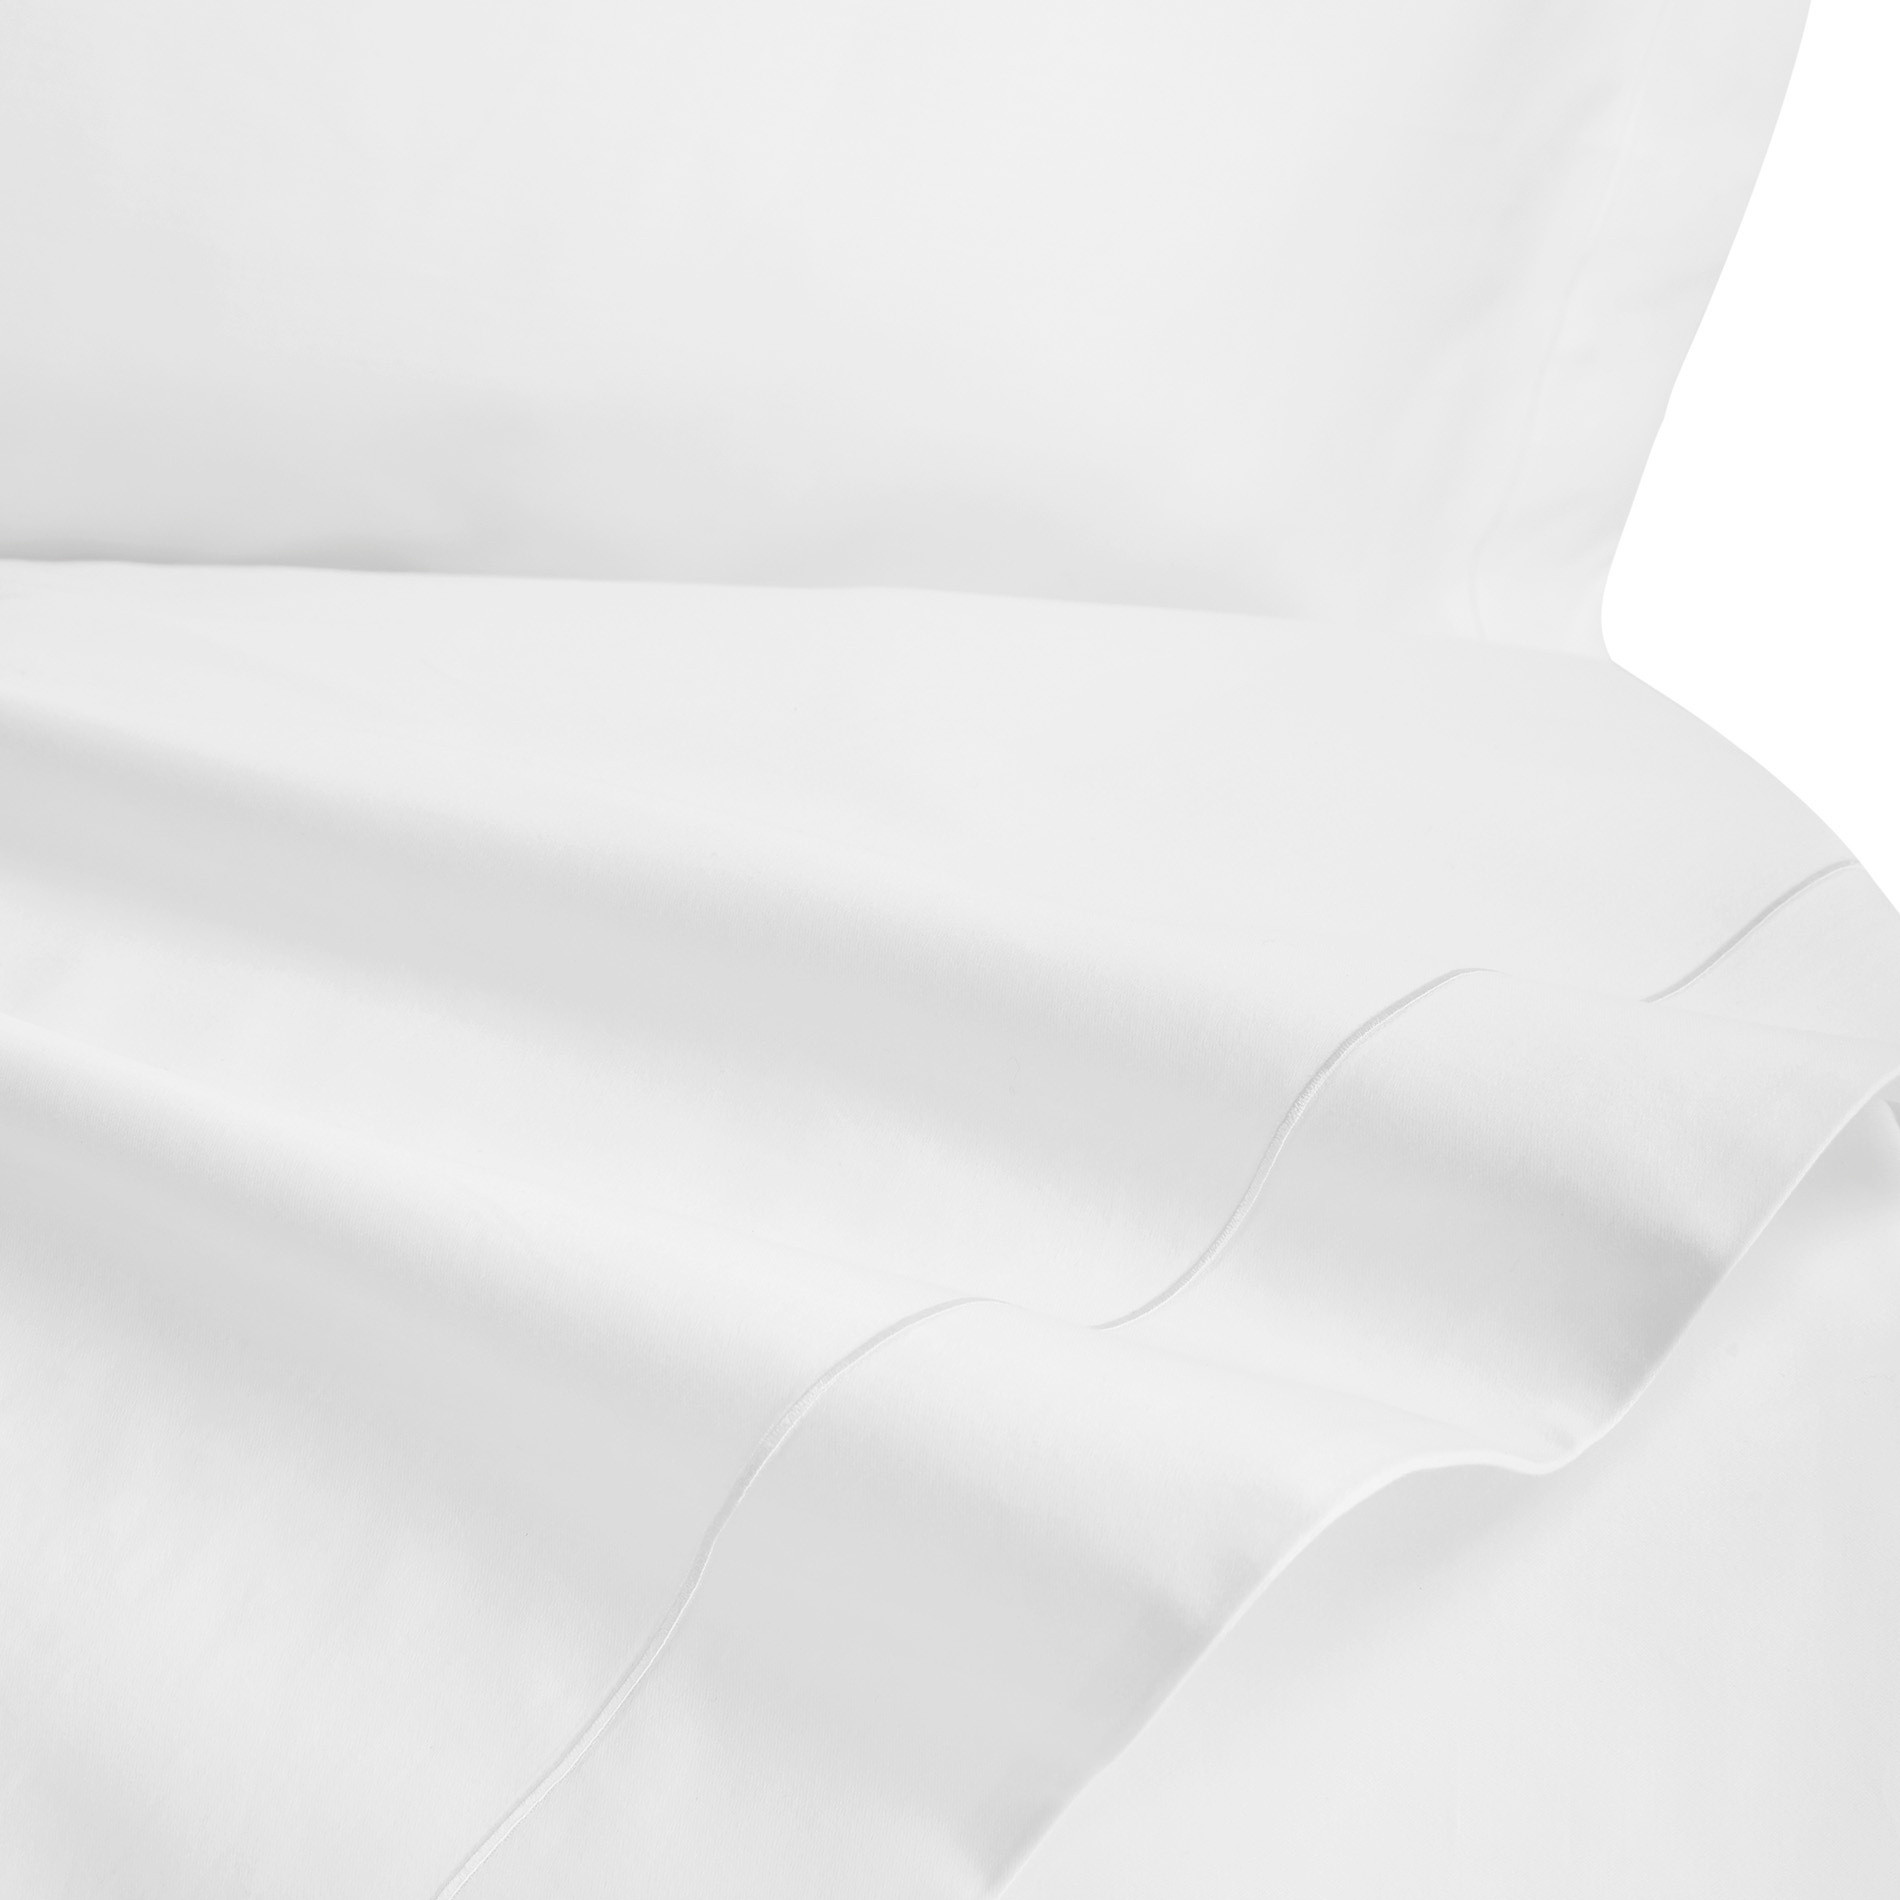 Lenzuolo liscio raso alta qualità Interno 11, Bianco, large image number 1